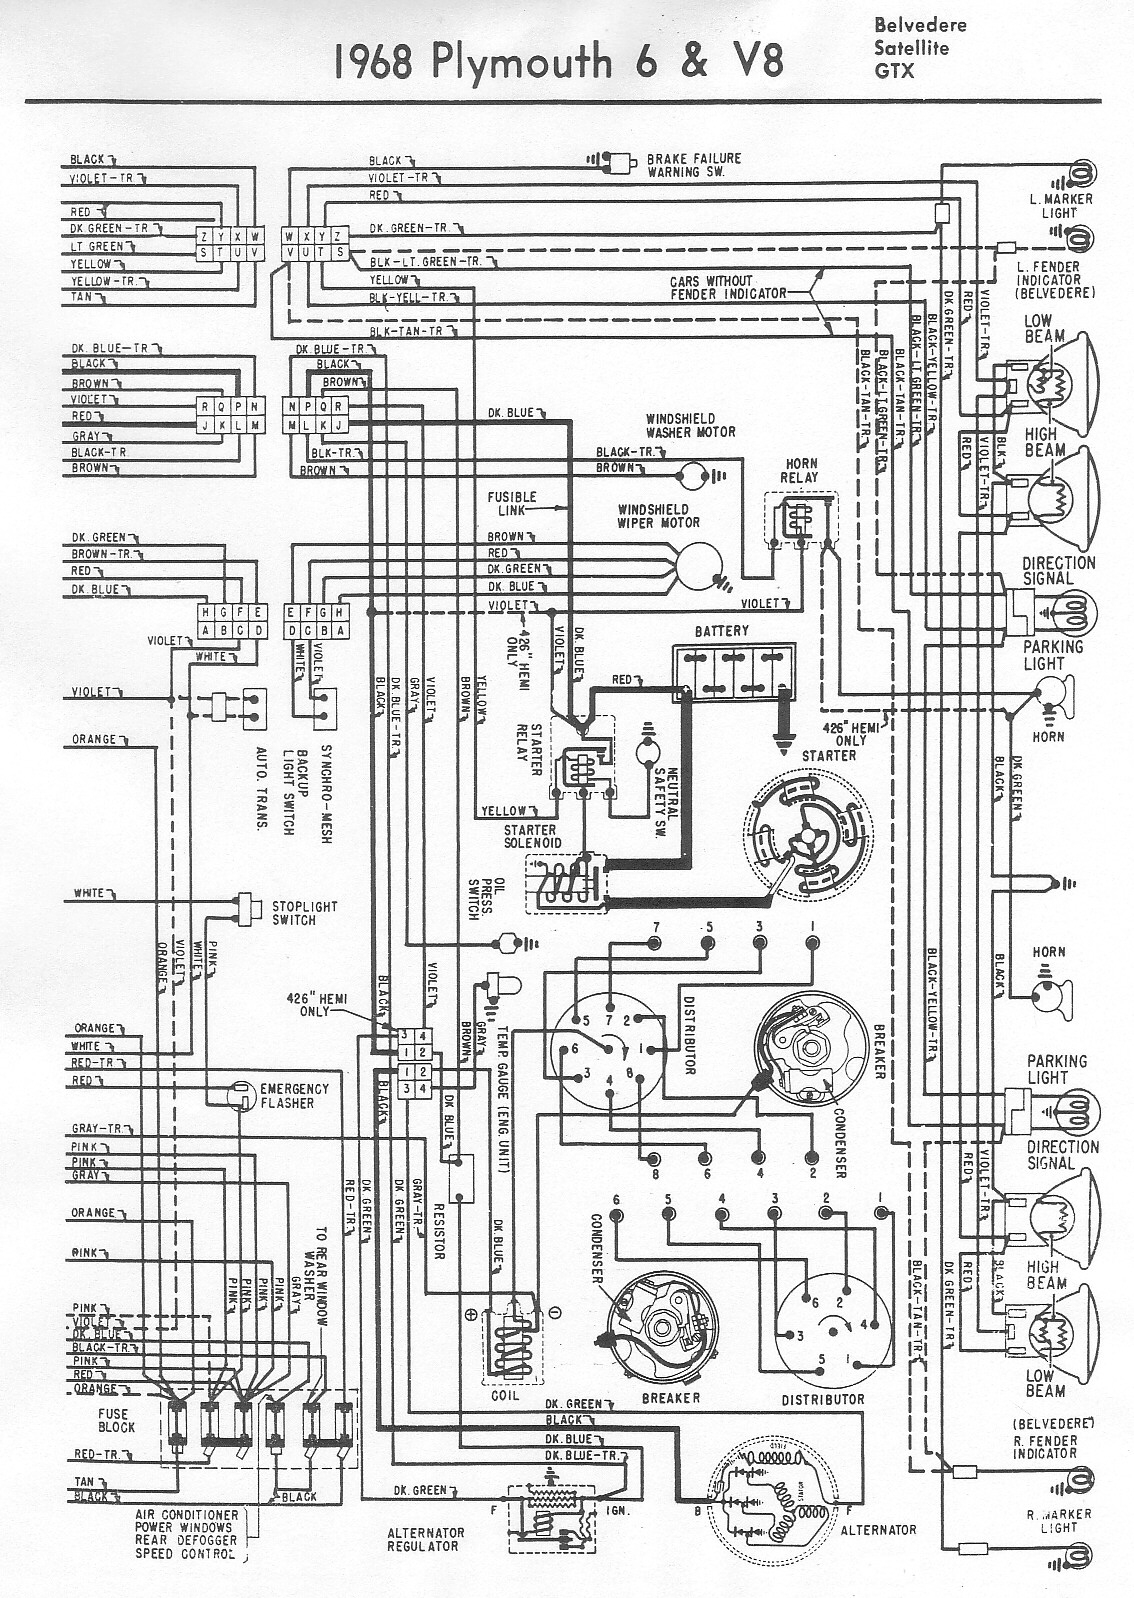 70 Mopar Wiring Diagram | Wiring Library - Mopar Wiring Diagram